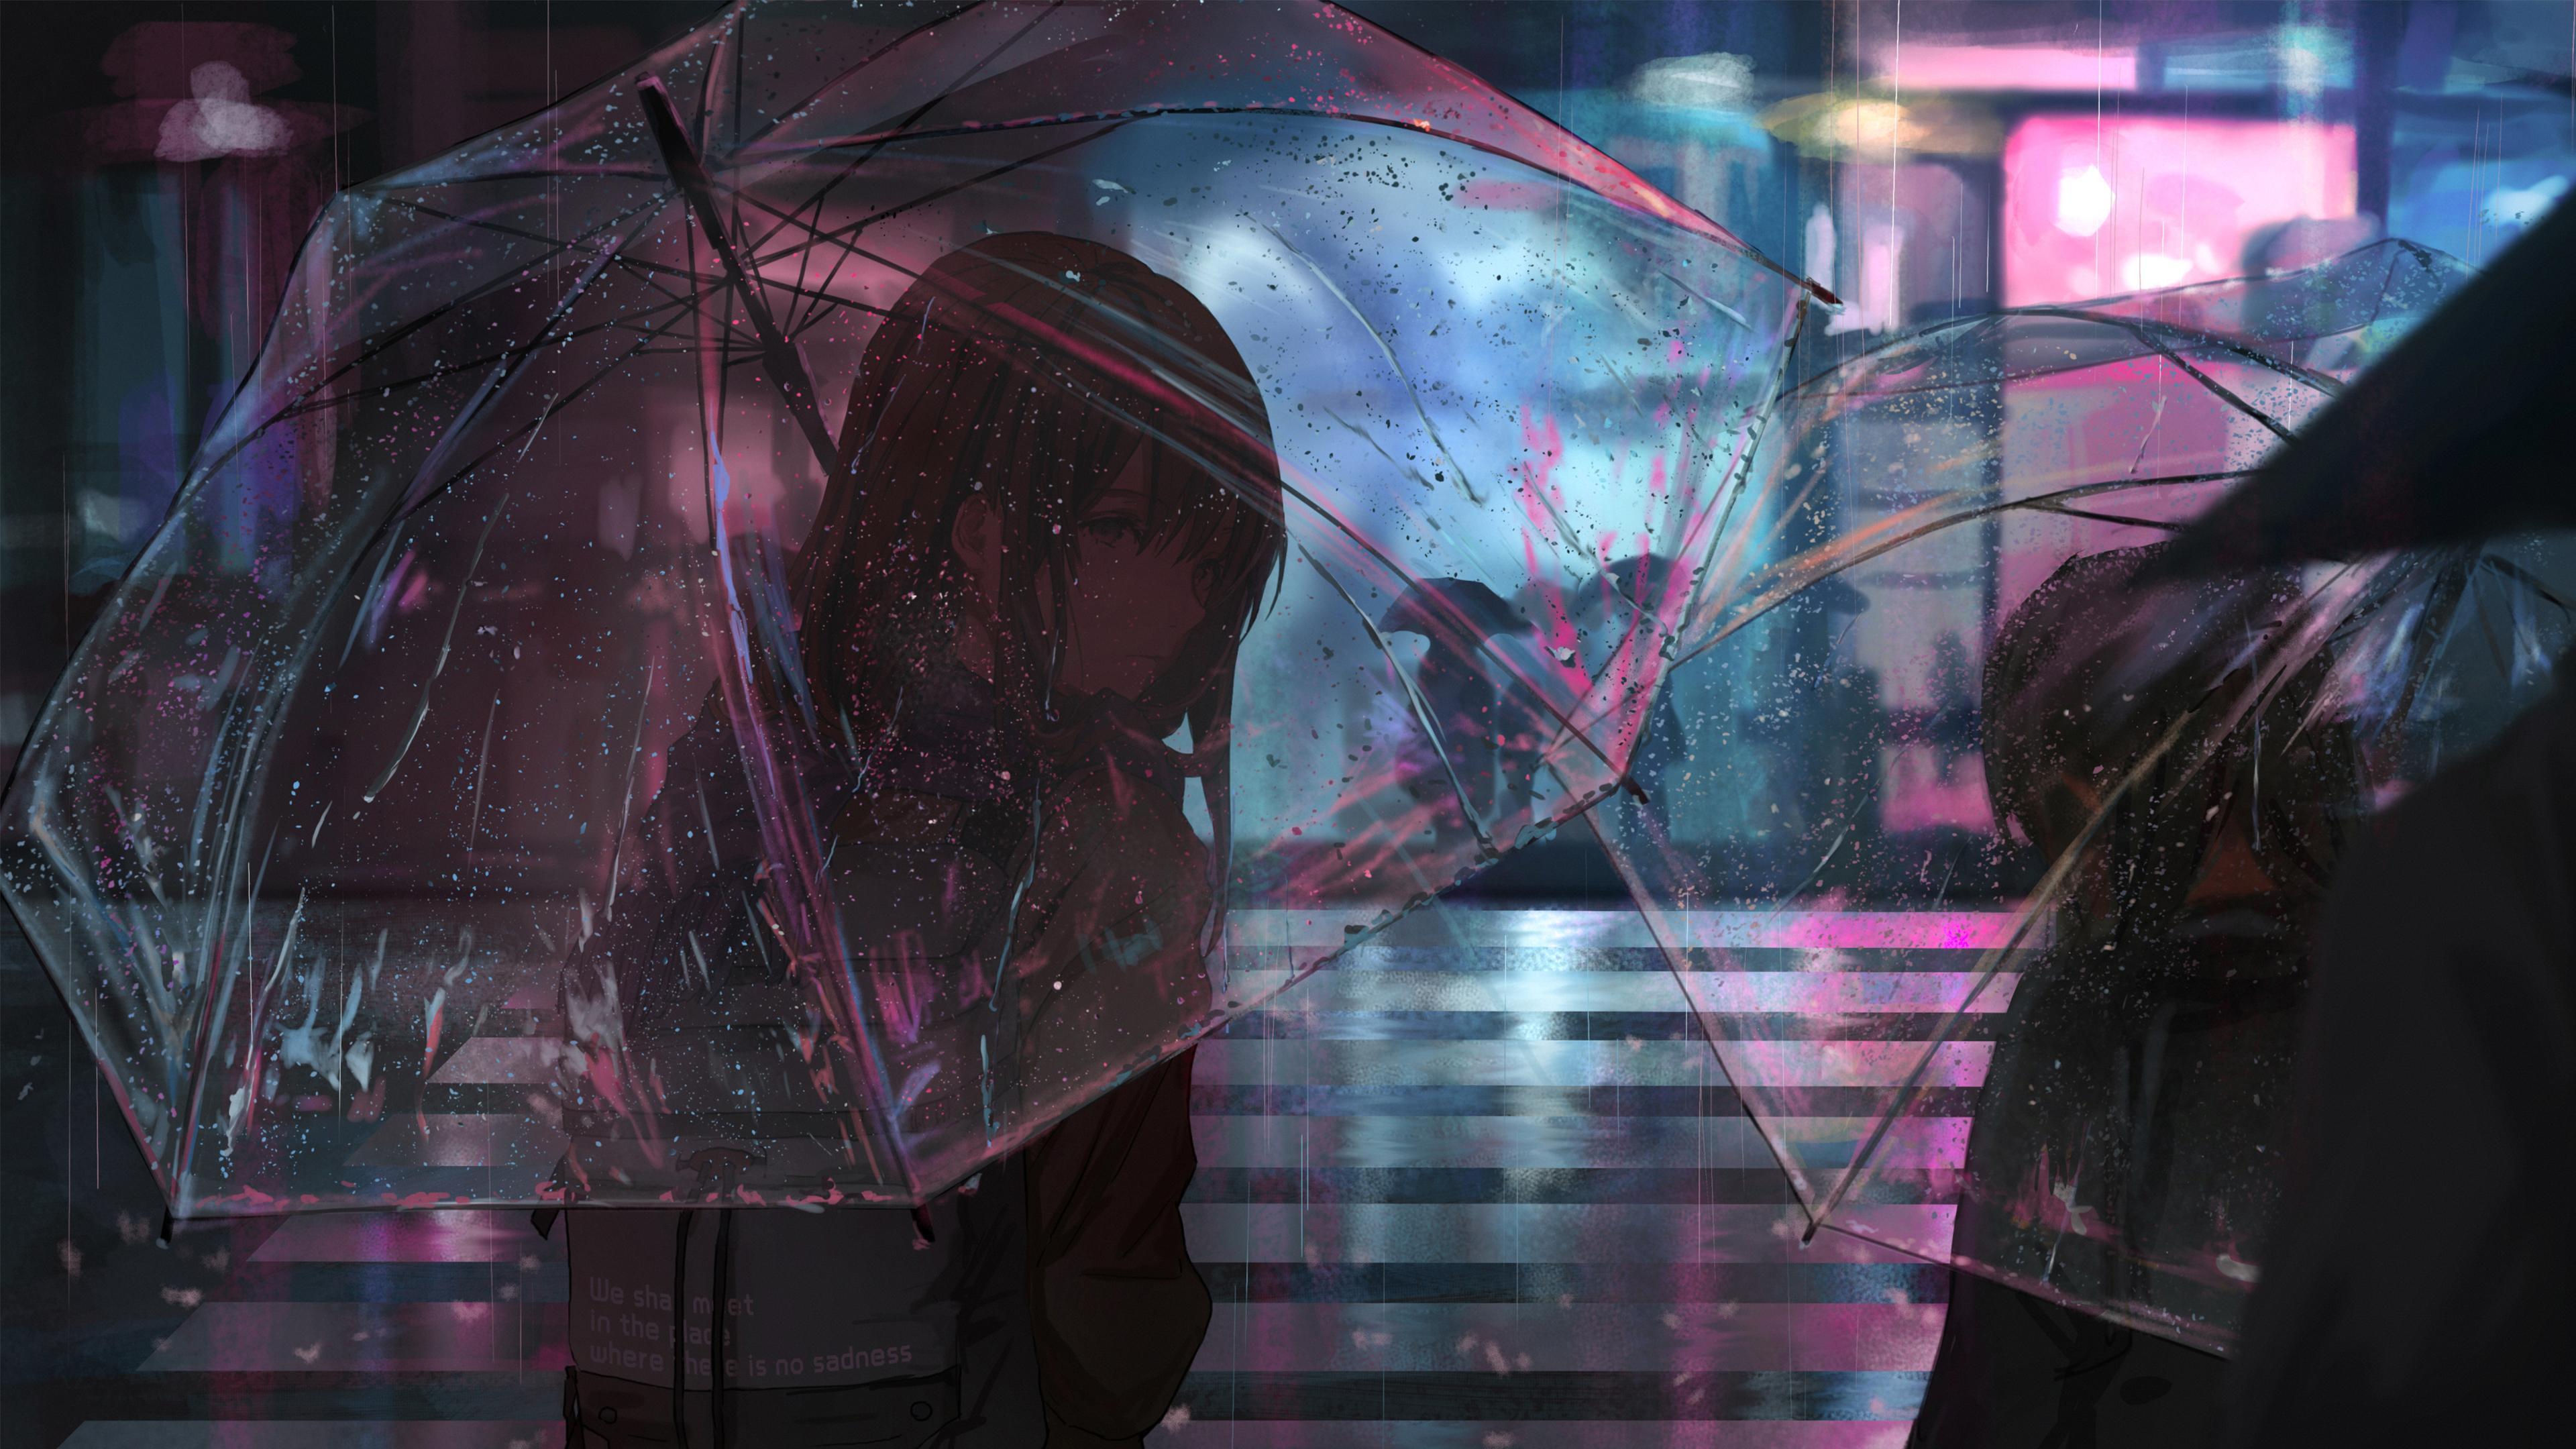 Rain Anime Wallpapers Wallpaper Cave